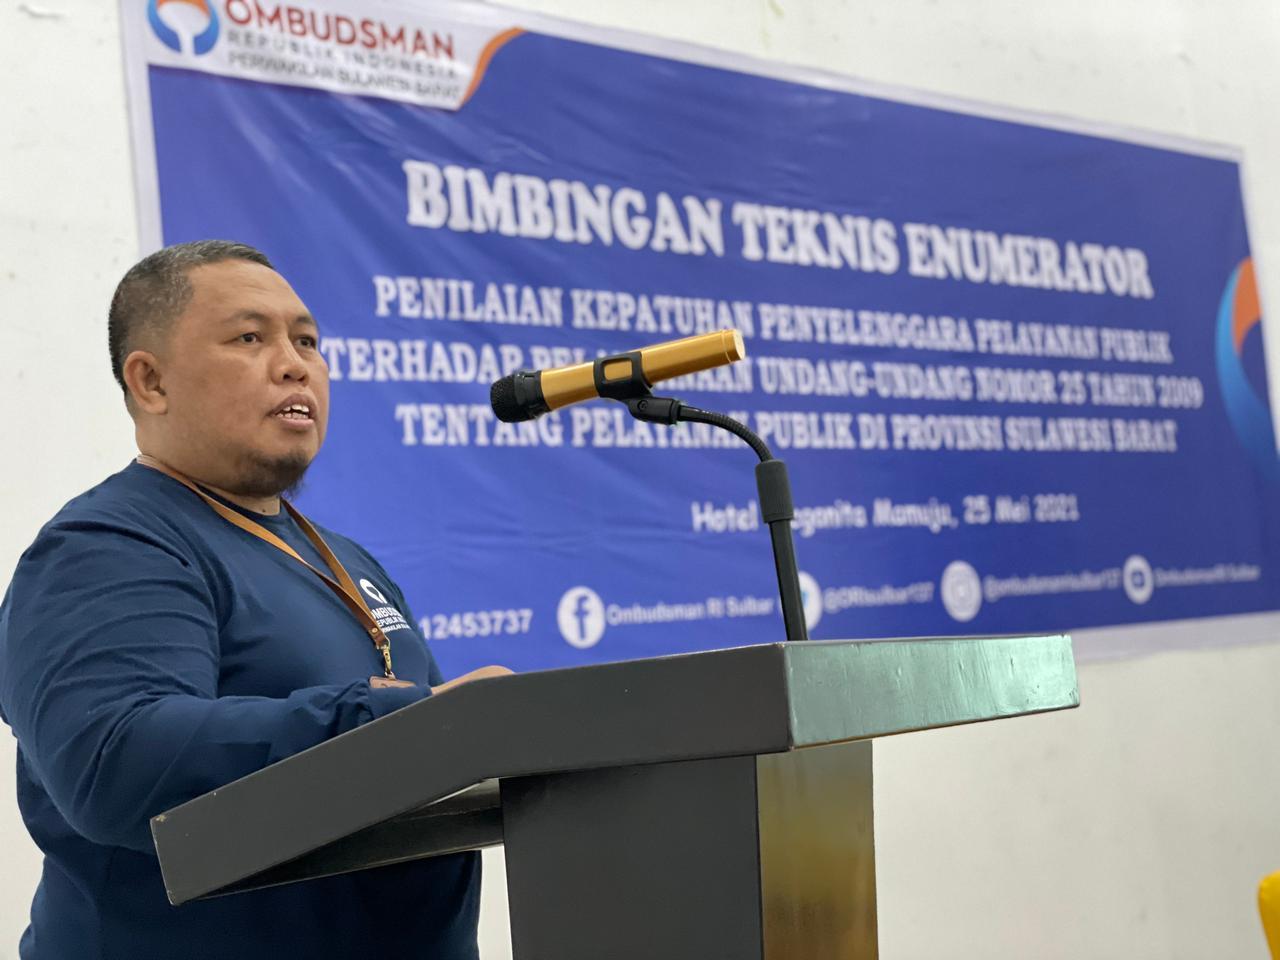 Ombudsman Sulbar Akan Melakukan Penilaian terhadap Penyelenggara Pelayanan Publik